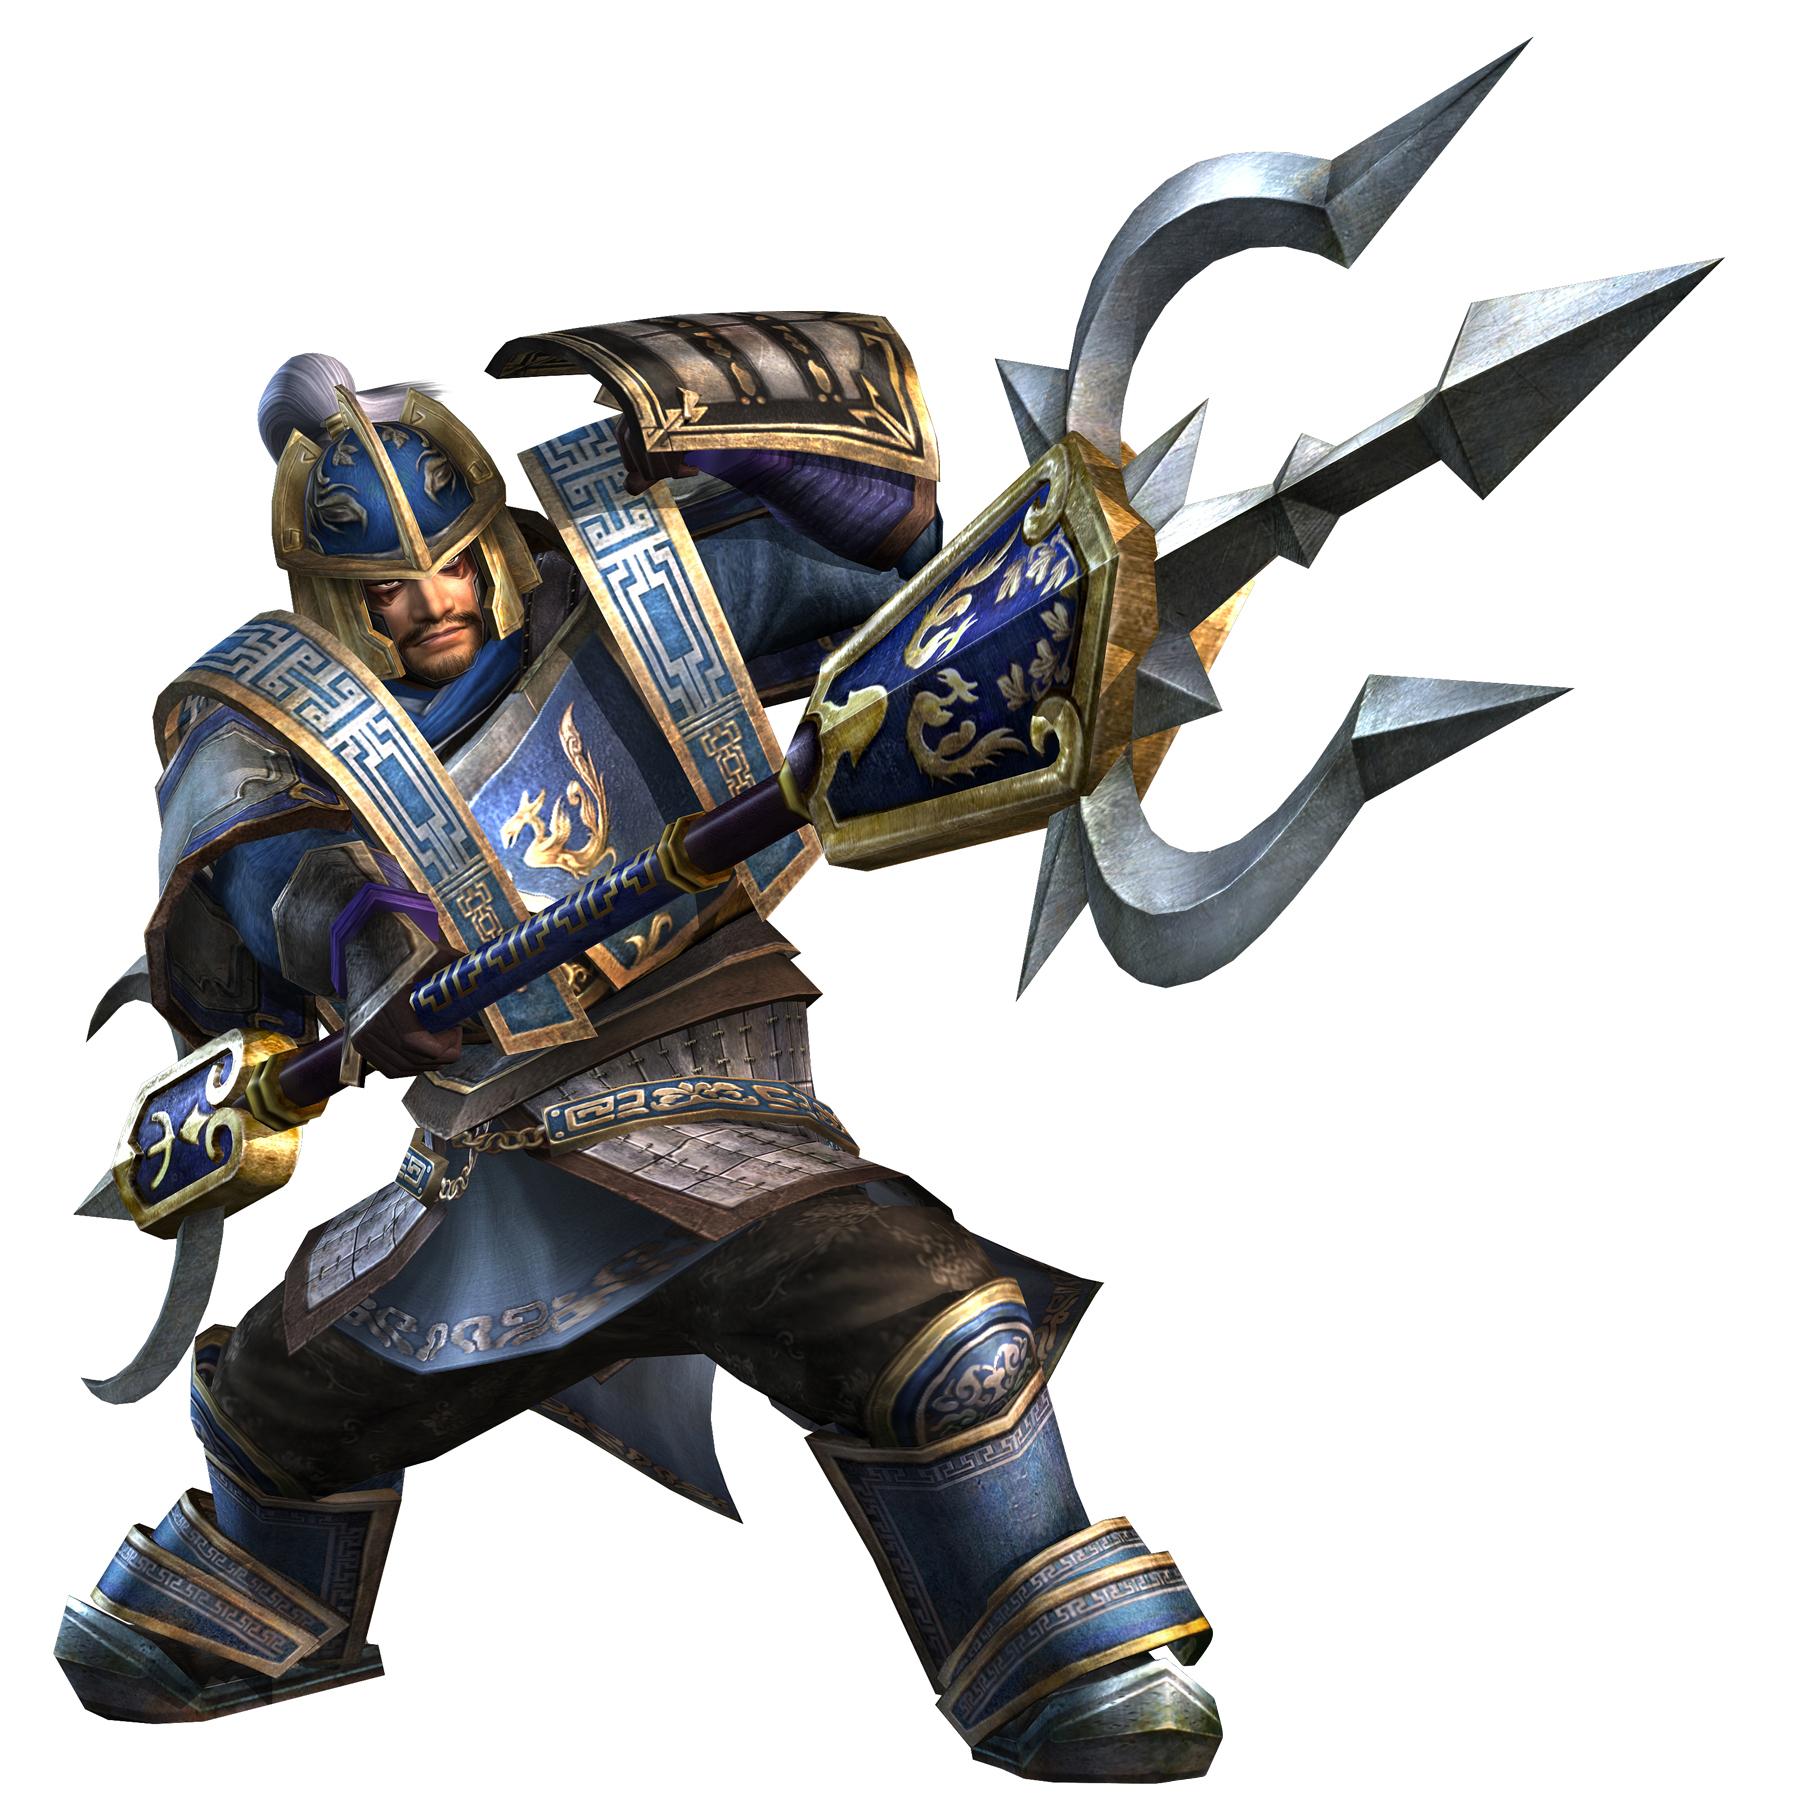 Warriors Orochi 3 Weapons: Caoren-dw6-render.jpg